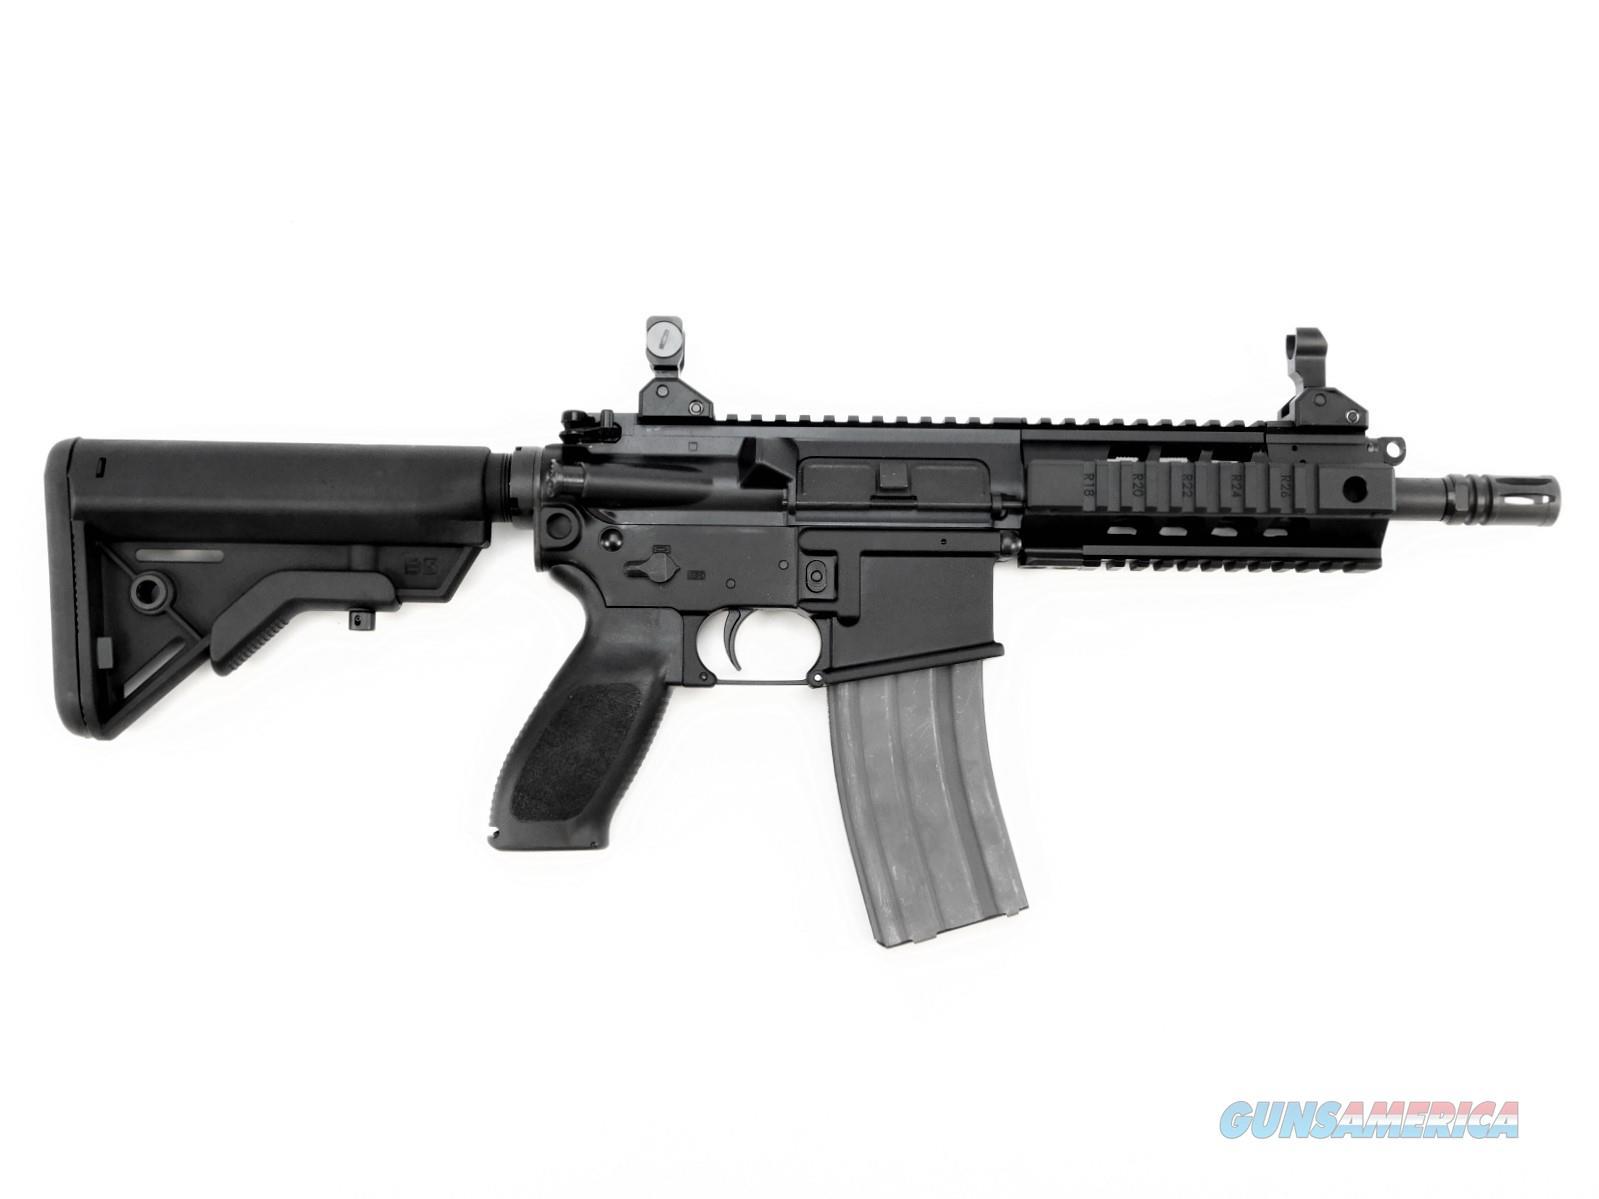 "Sig Sauer 516 PDW SBR 5.56 NATO 7.5"" 30 Rds R516G2-7B-PDW-SBR   Guns > Rifles > Class 3 Rifles > Class 3 Subguns"